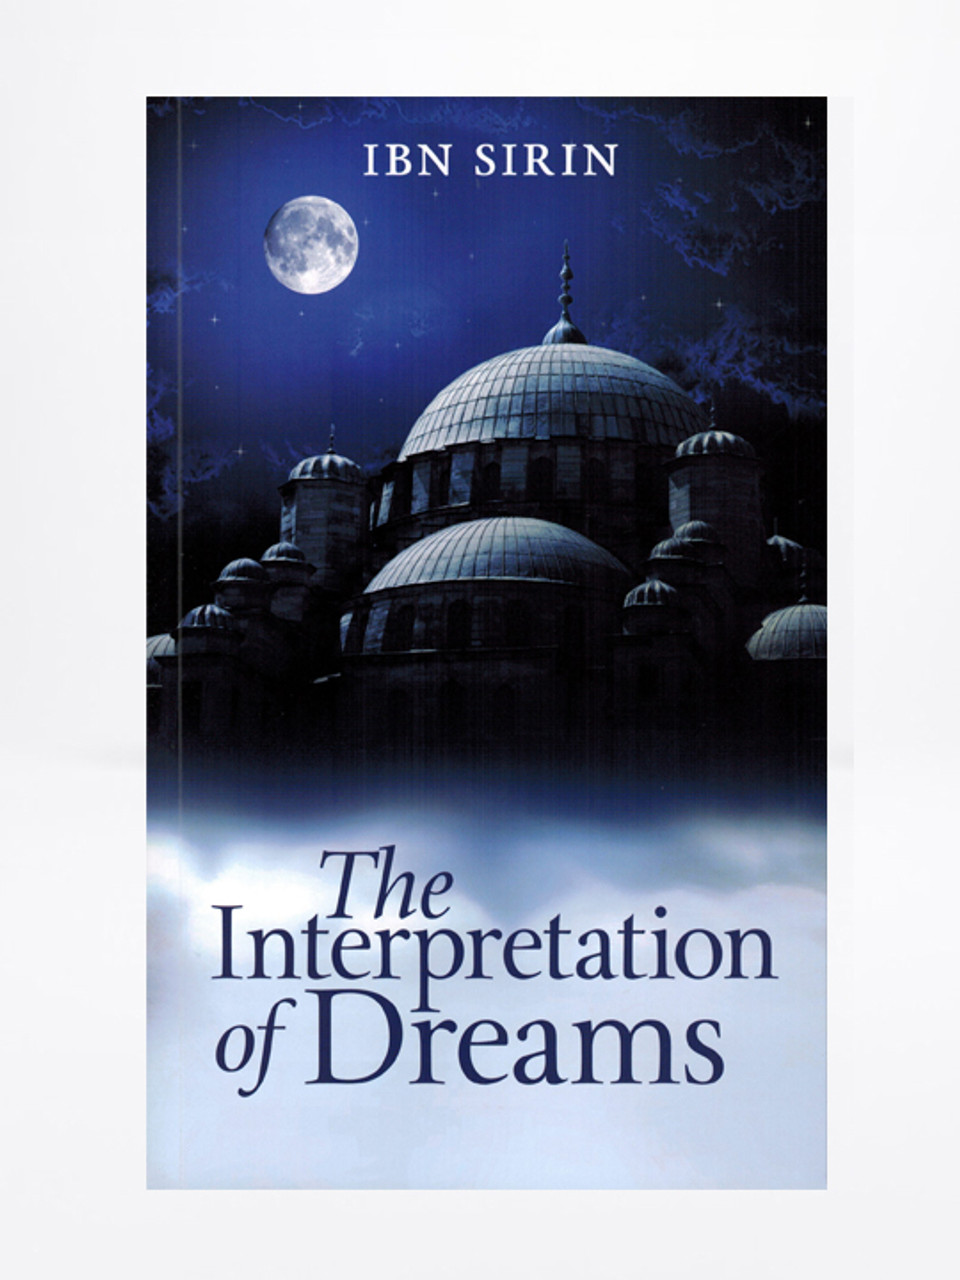 ibn sirin dream interpretation